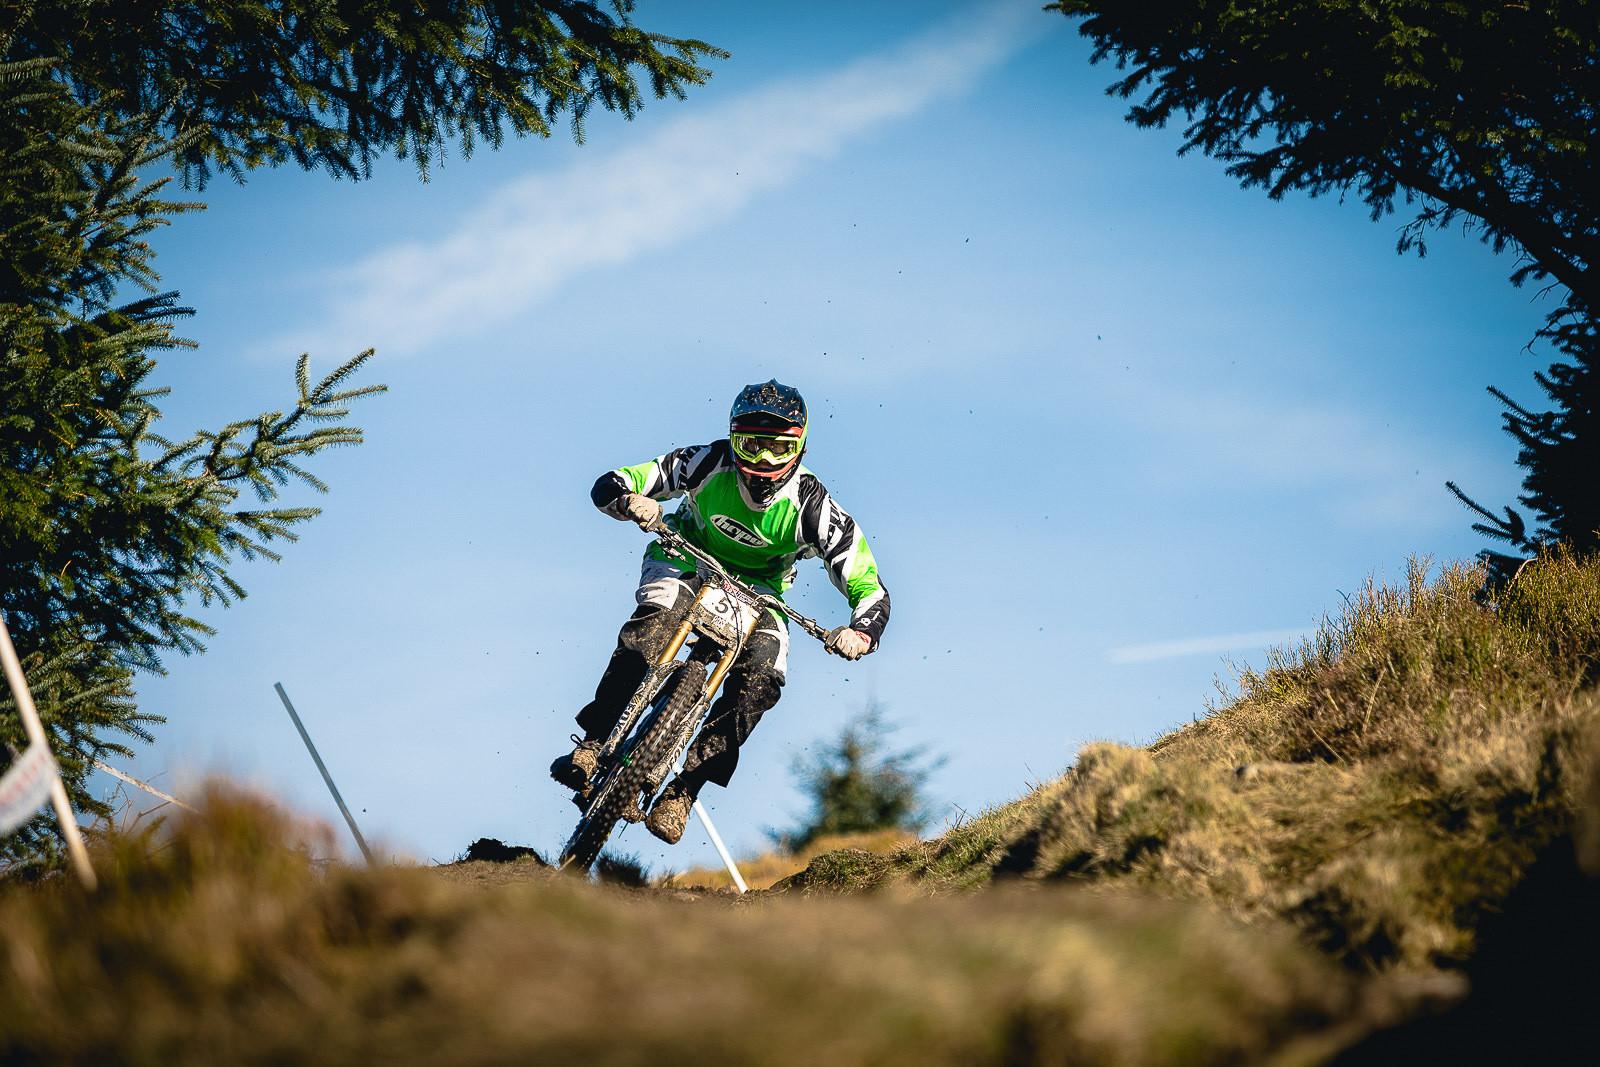 Craig Evans, British Downhill Series 1, Ae Forest - World Cup Warm-Up - British DH Series Ae Forest Action - Mountain Biking Pictures - Vital MTB